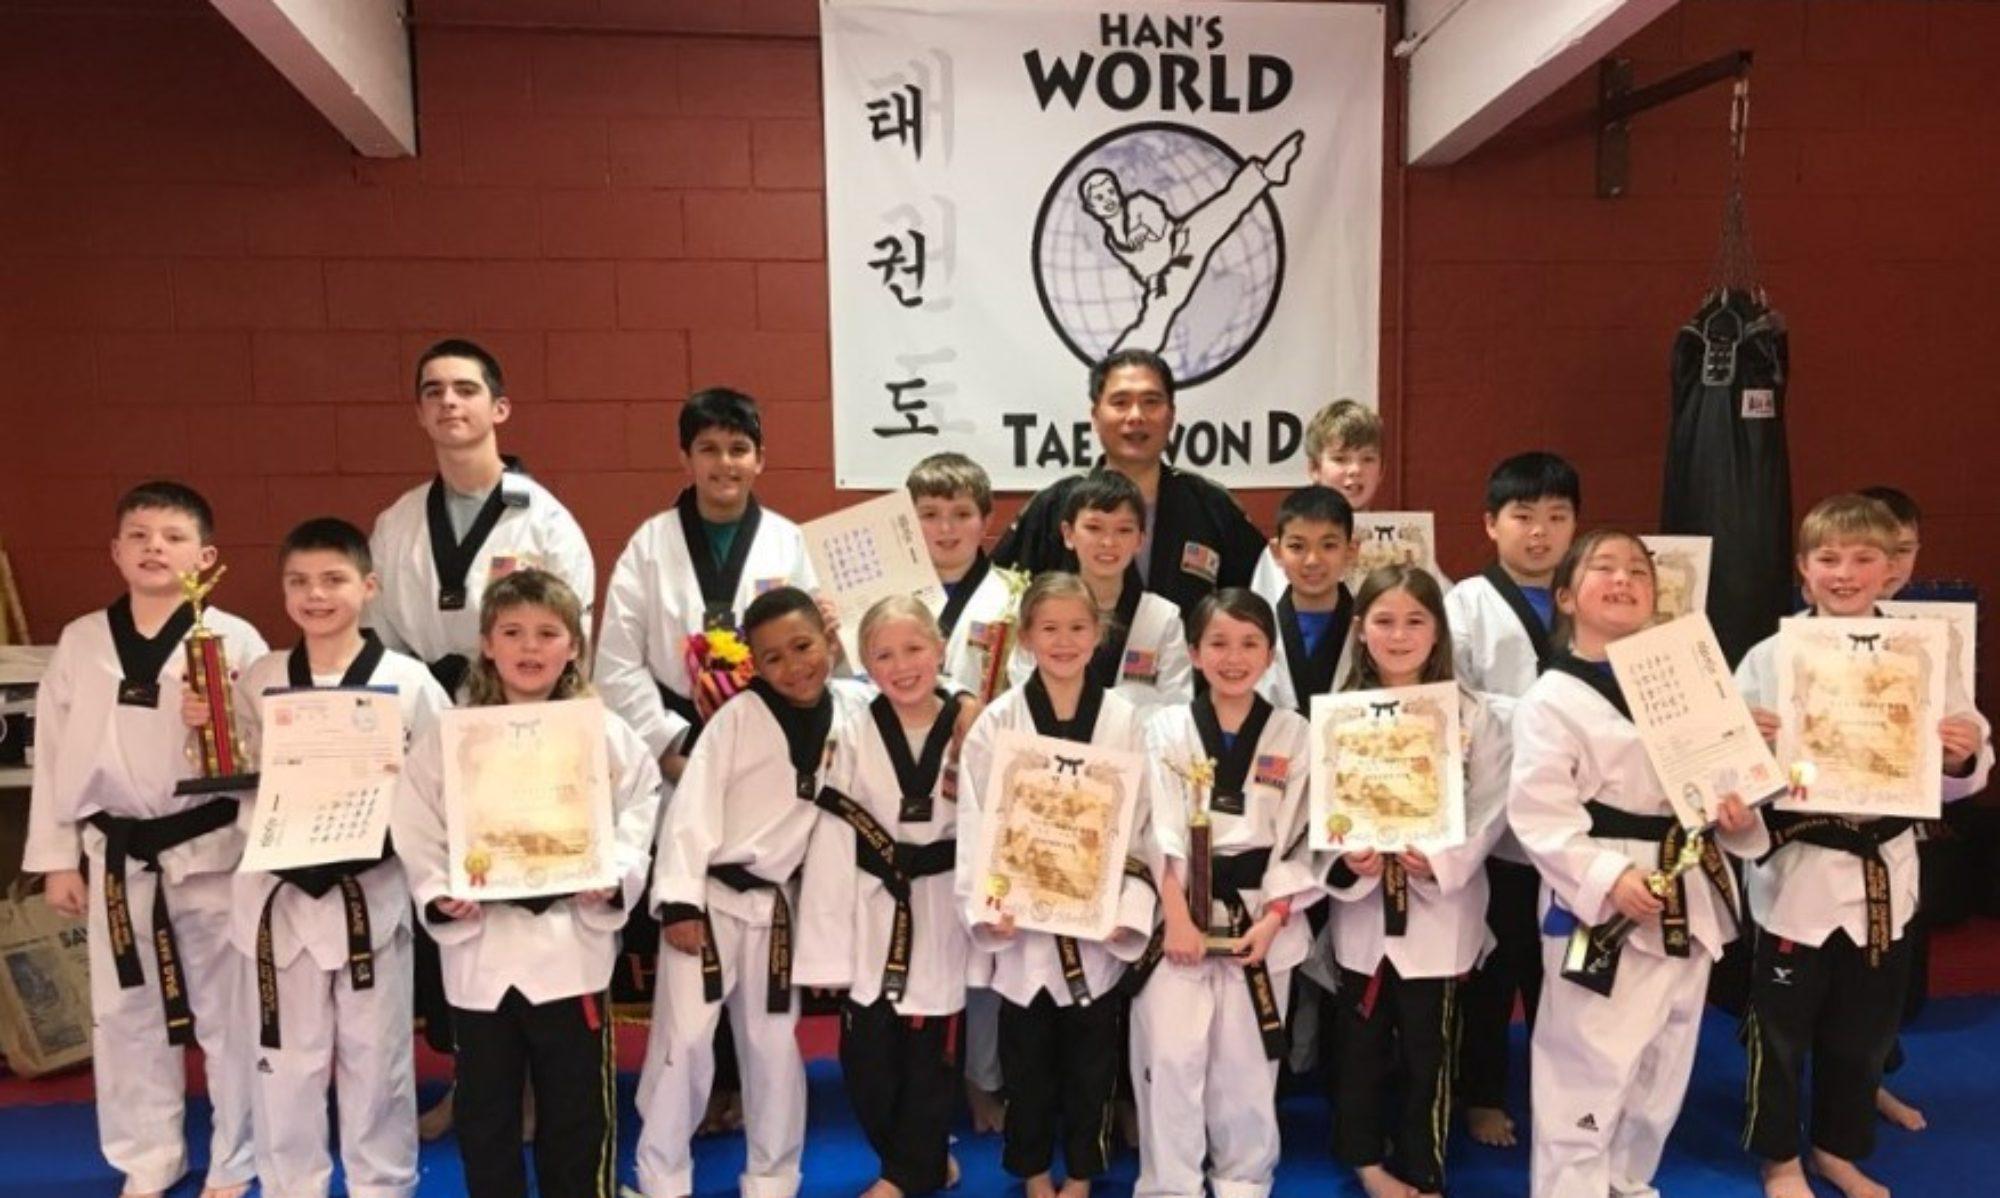 Washington Premier Taekwondo Academy